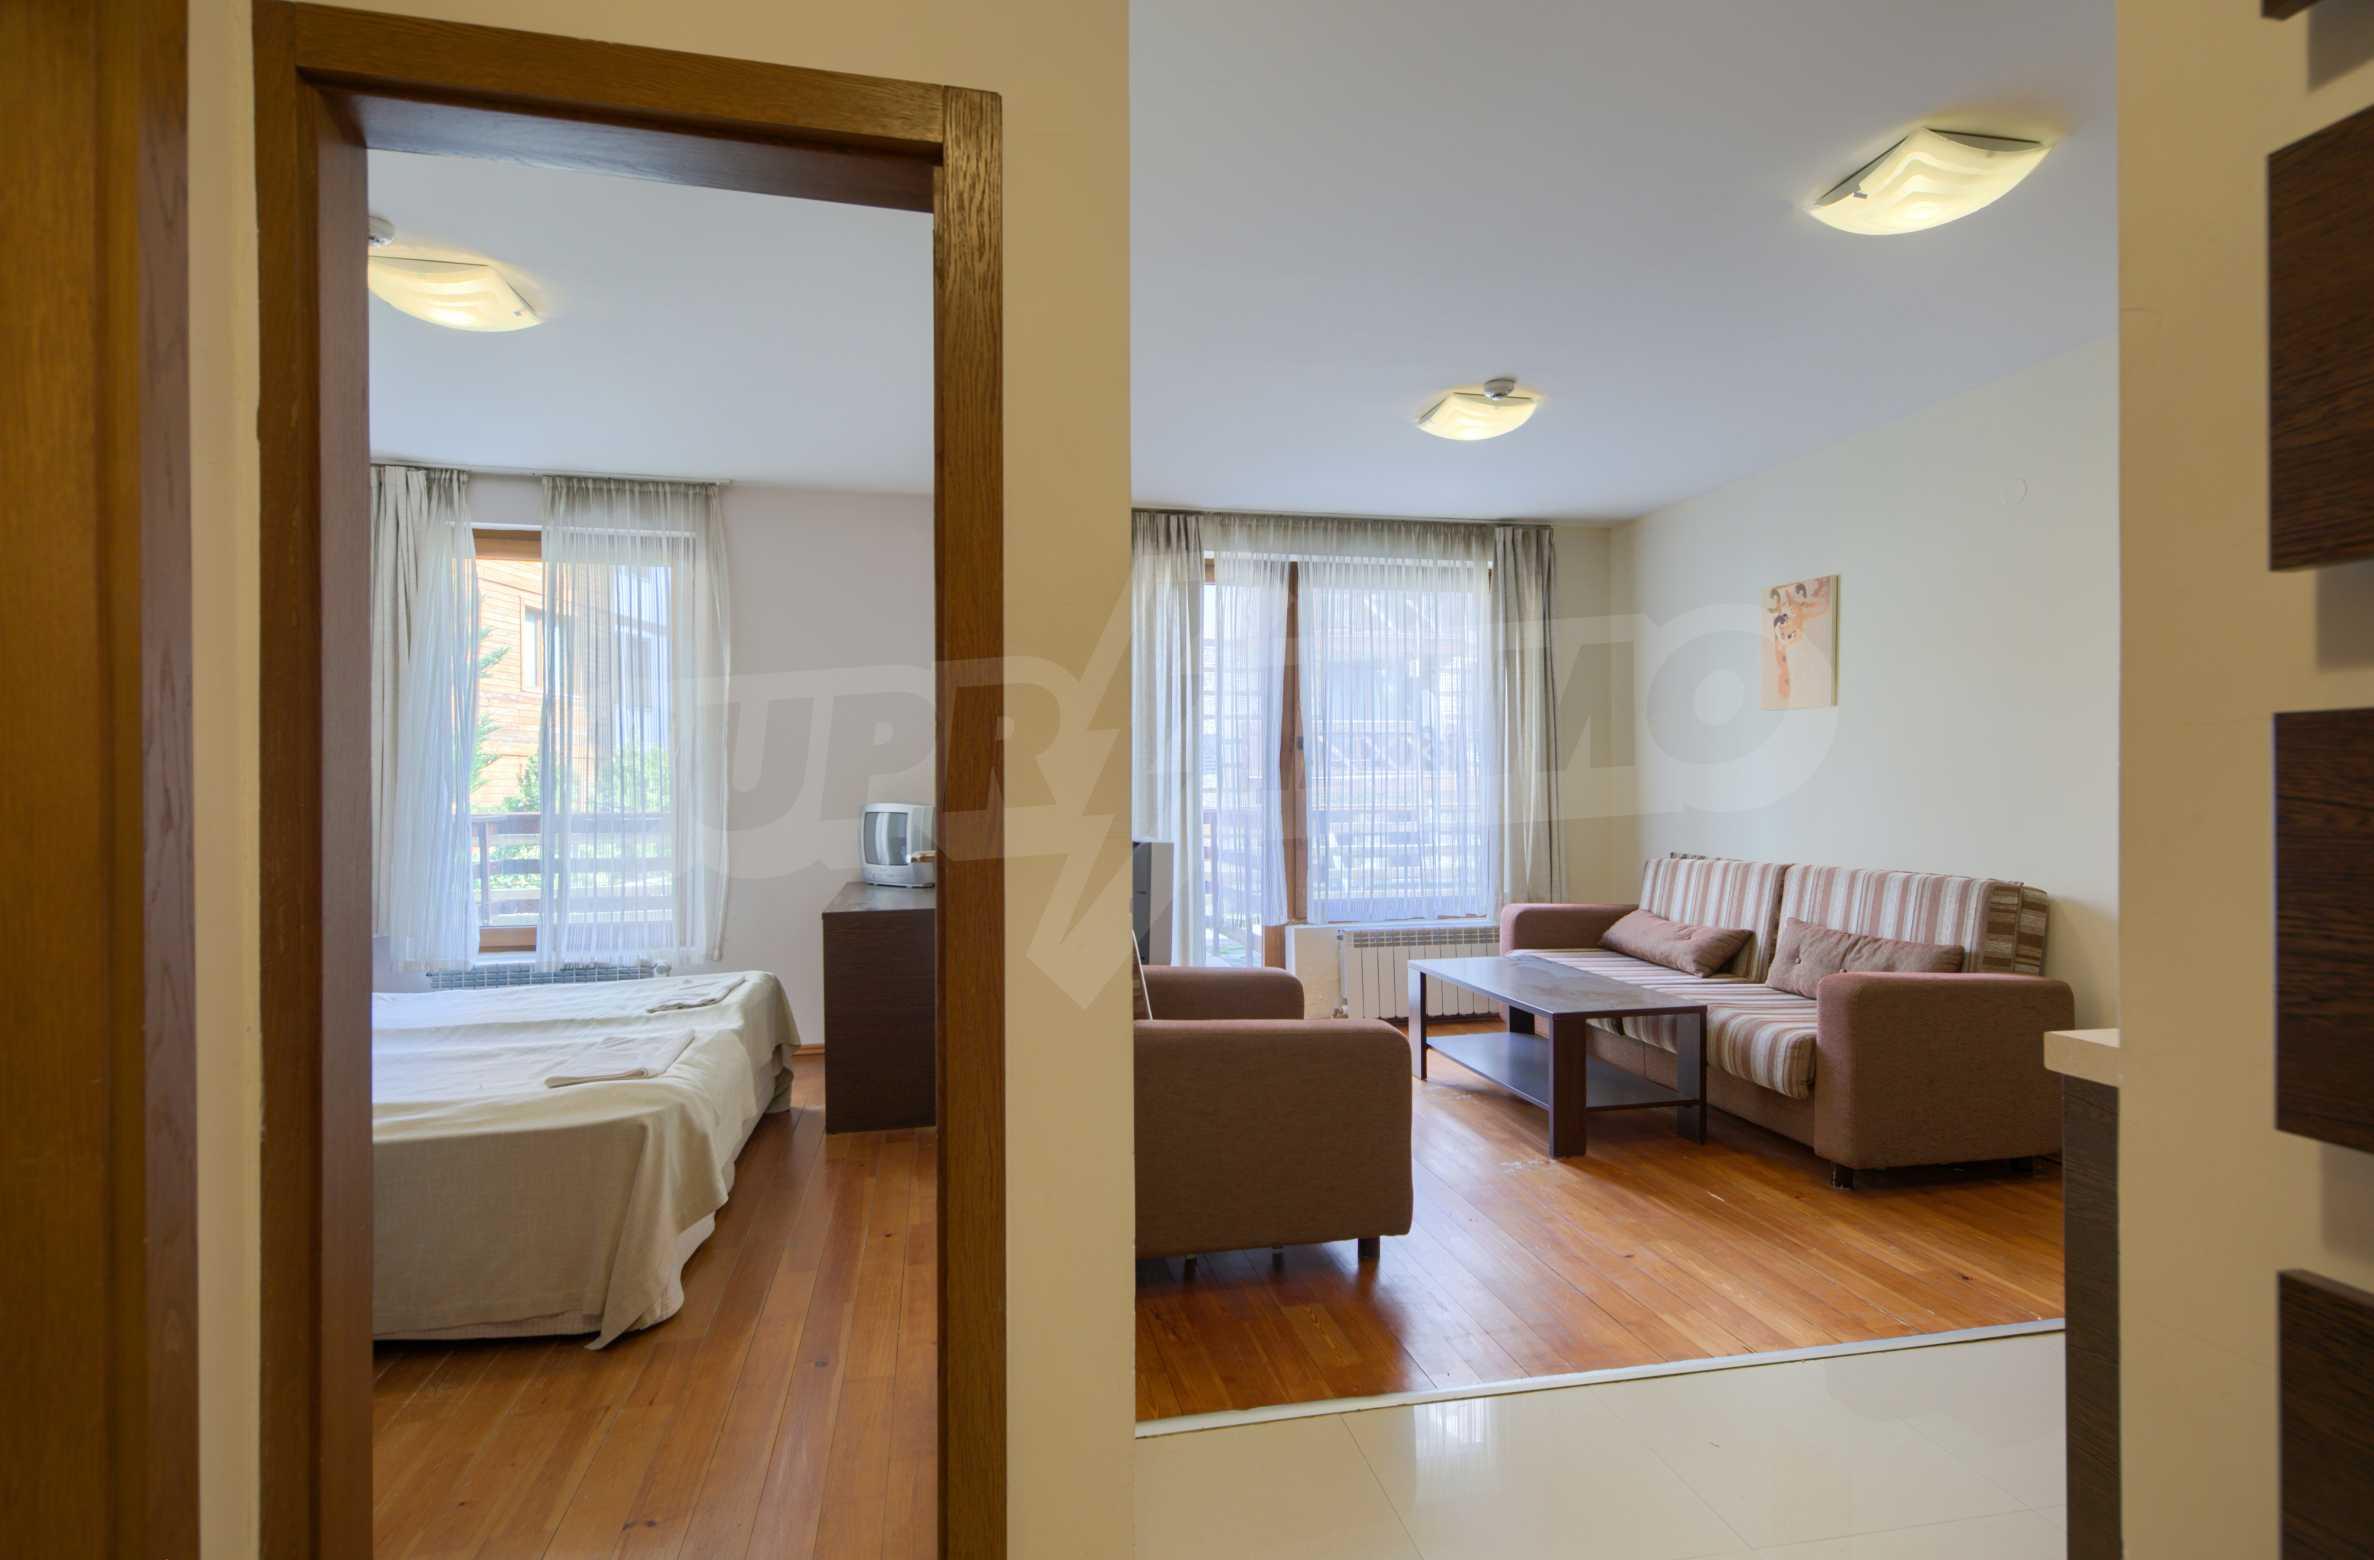 Двустаен апартамент за продажба в гр. Банско 1